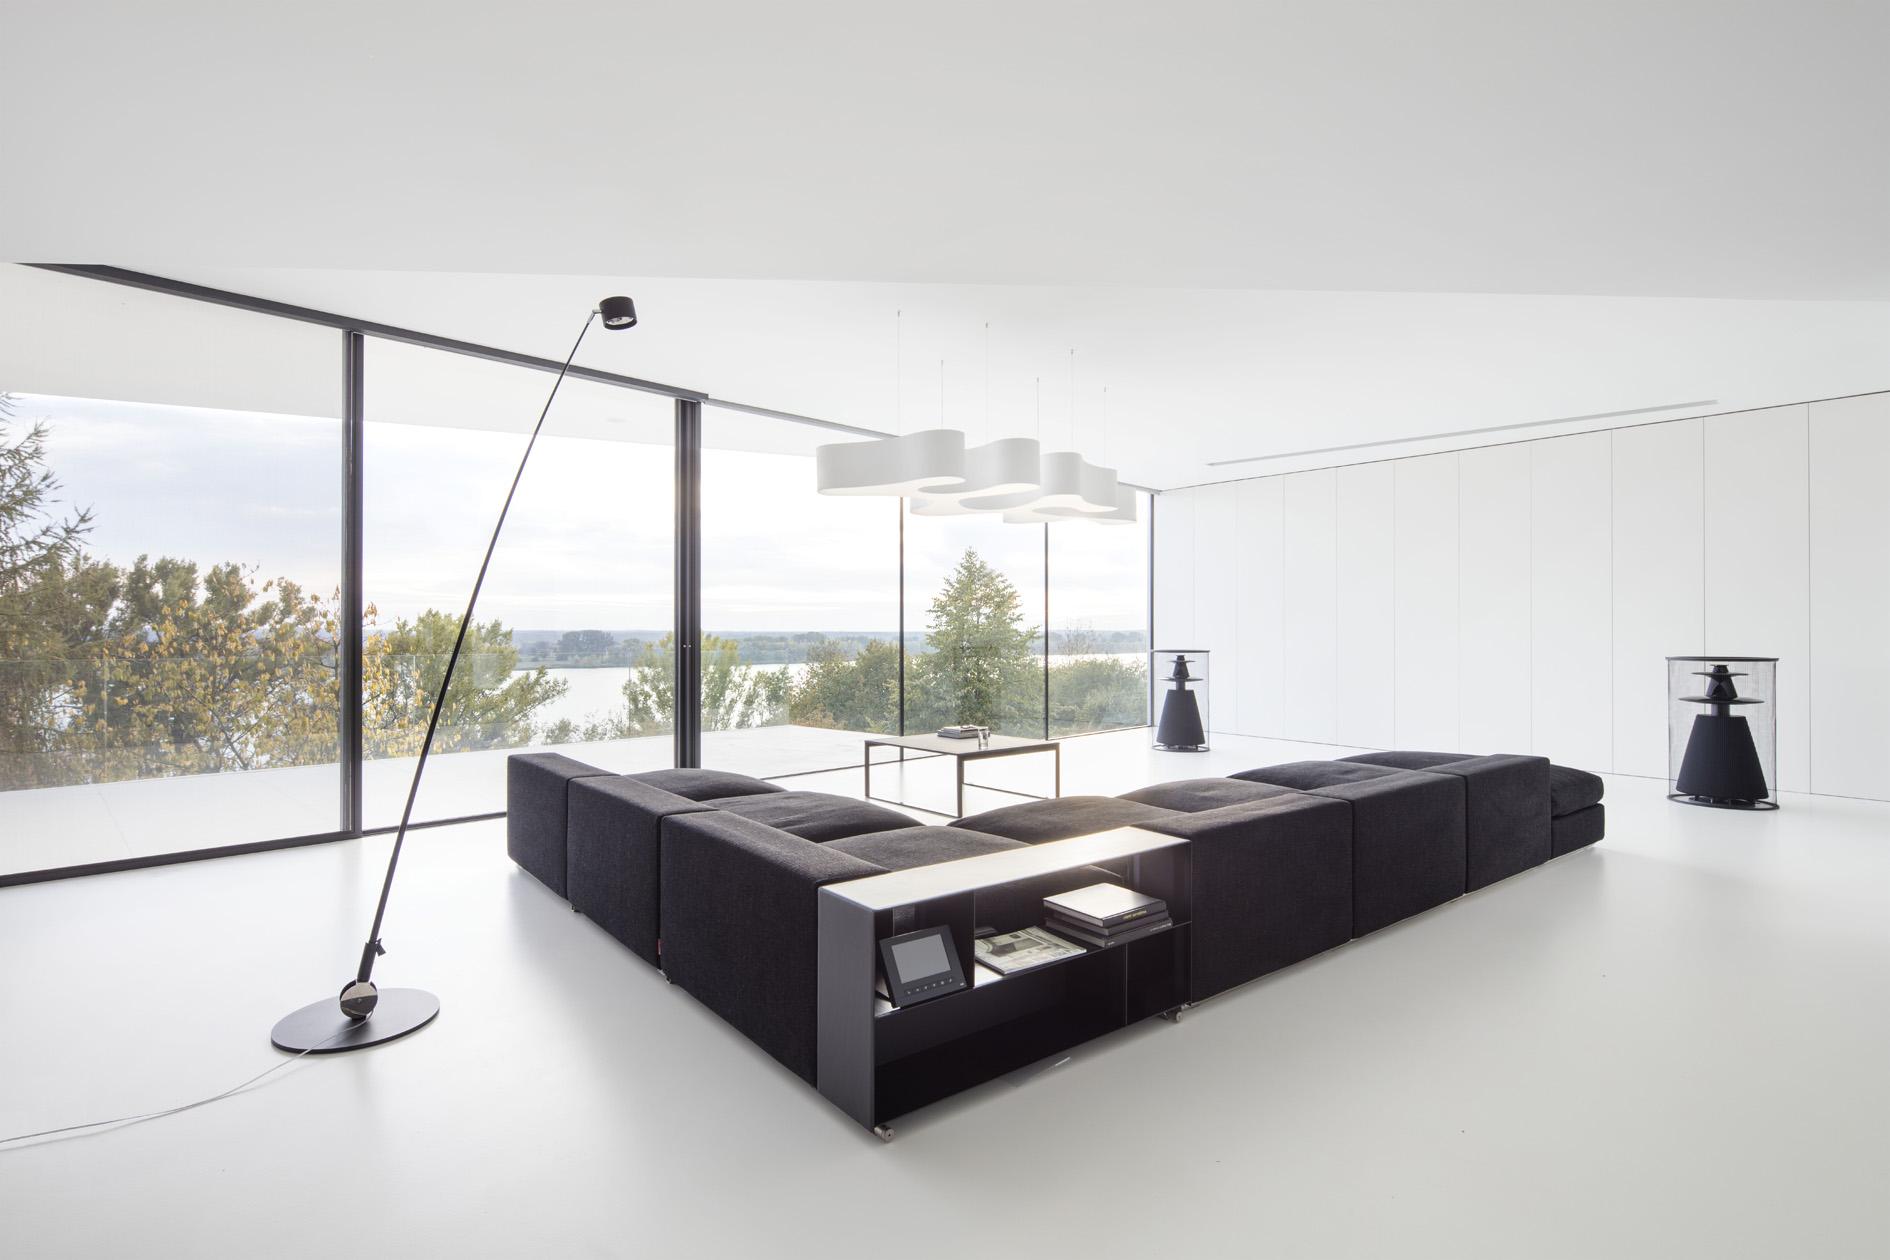 <p>Beeld Olo Studio, By The Way House, Polen – Robert Konieczny en KWK Promes team</p>